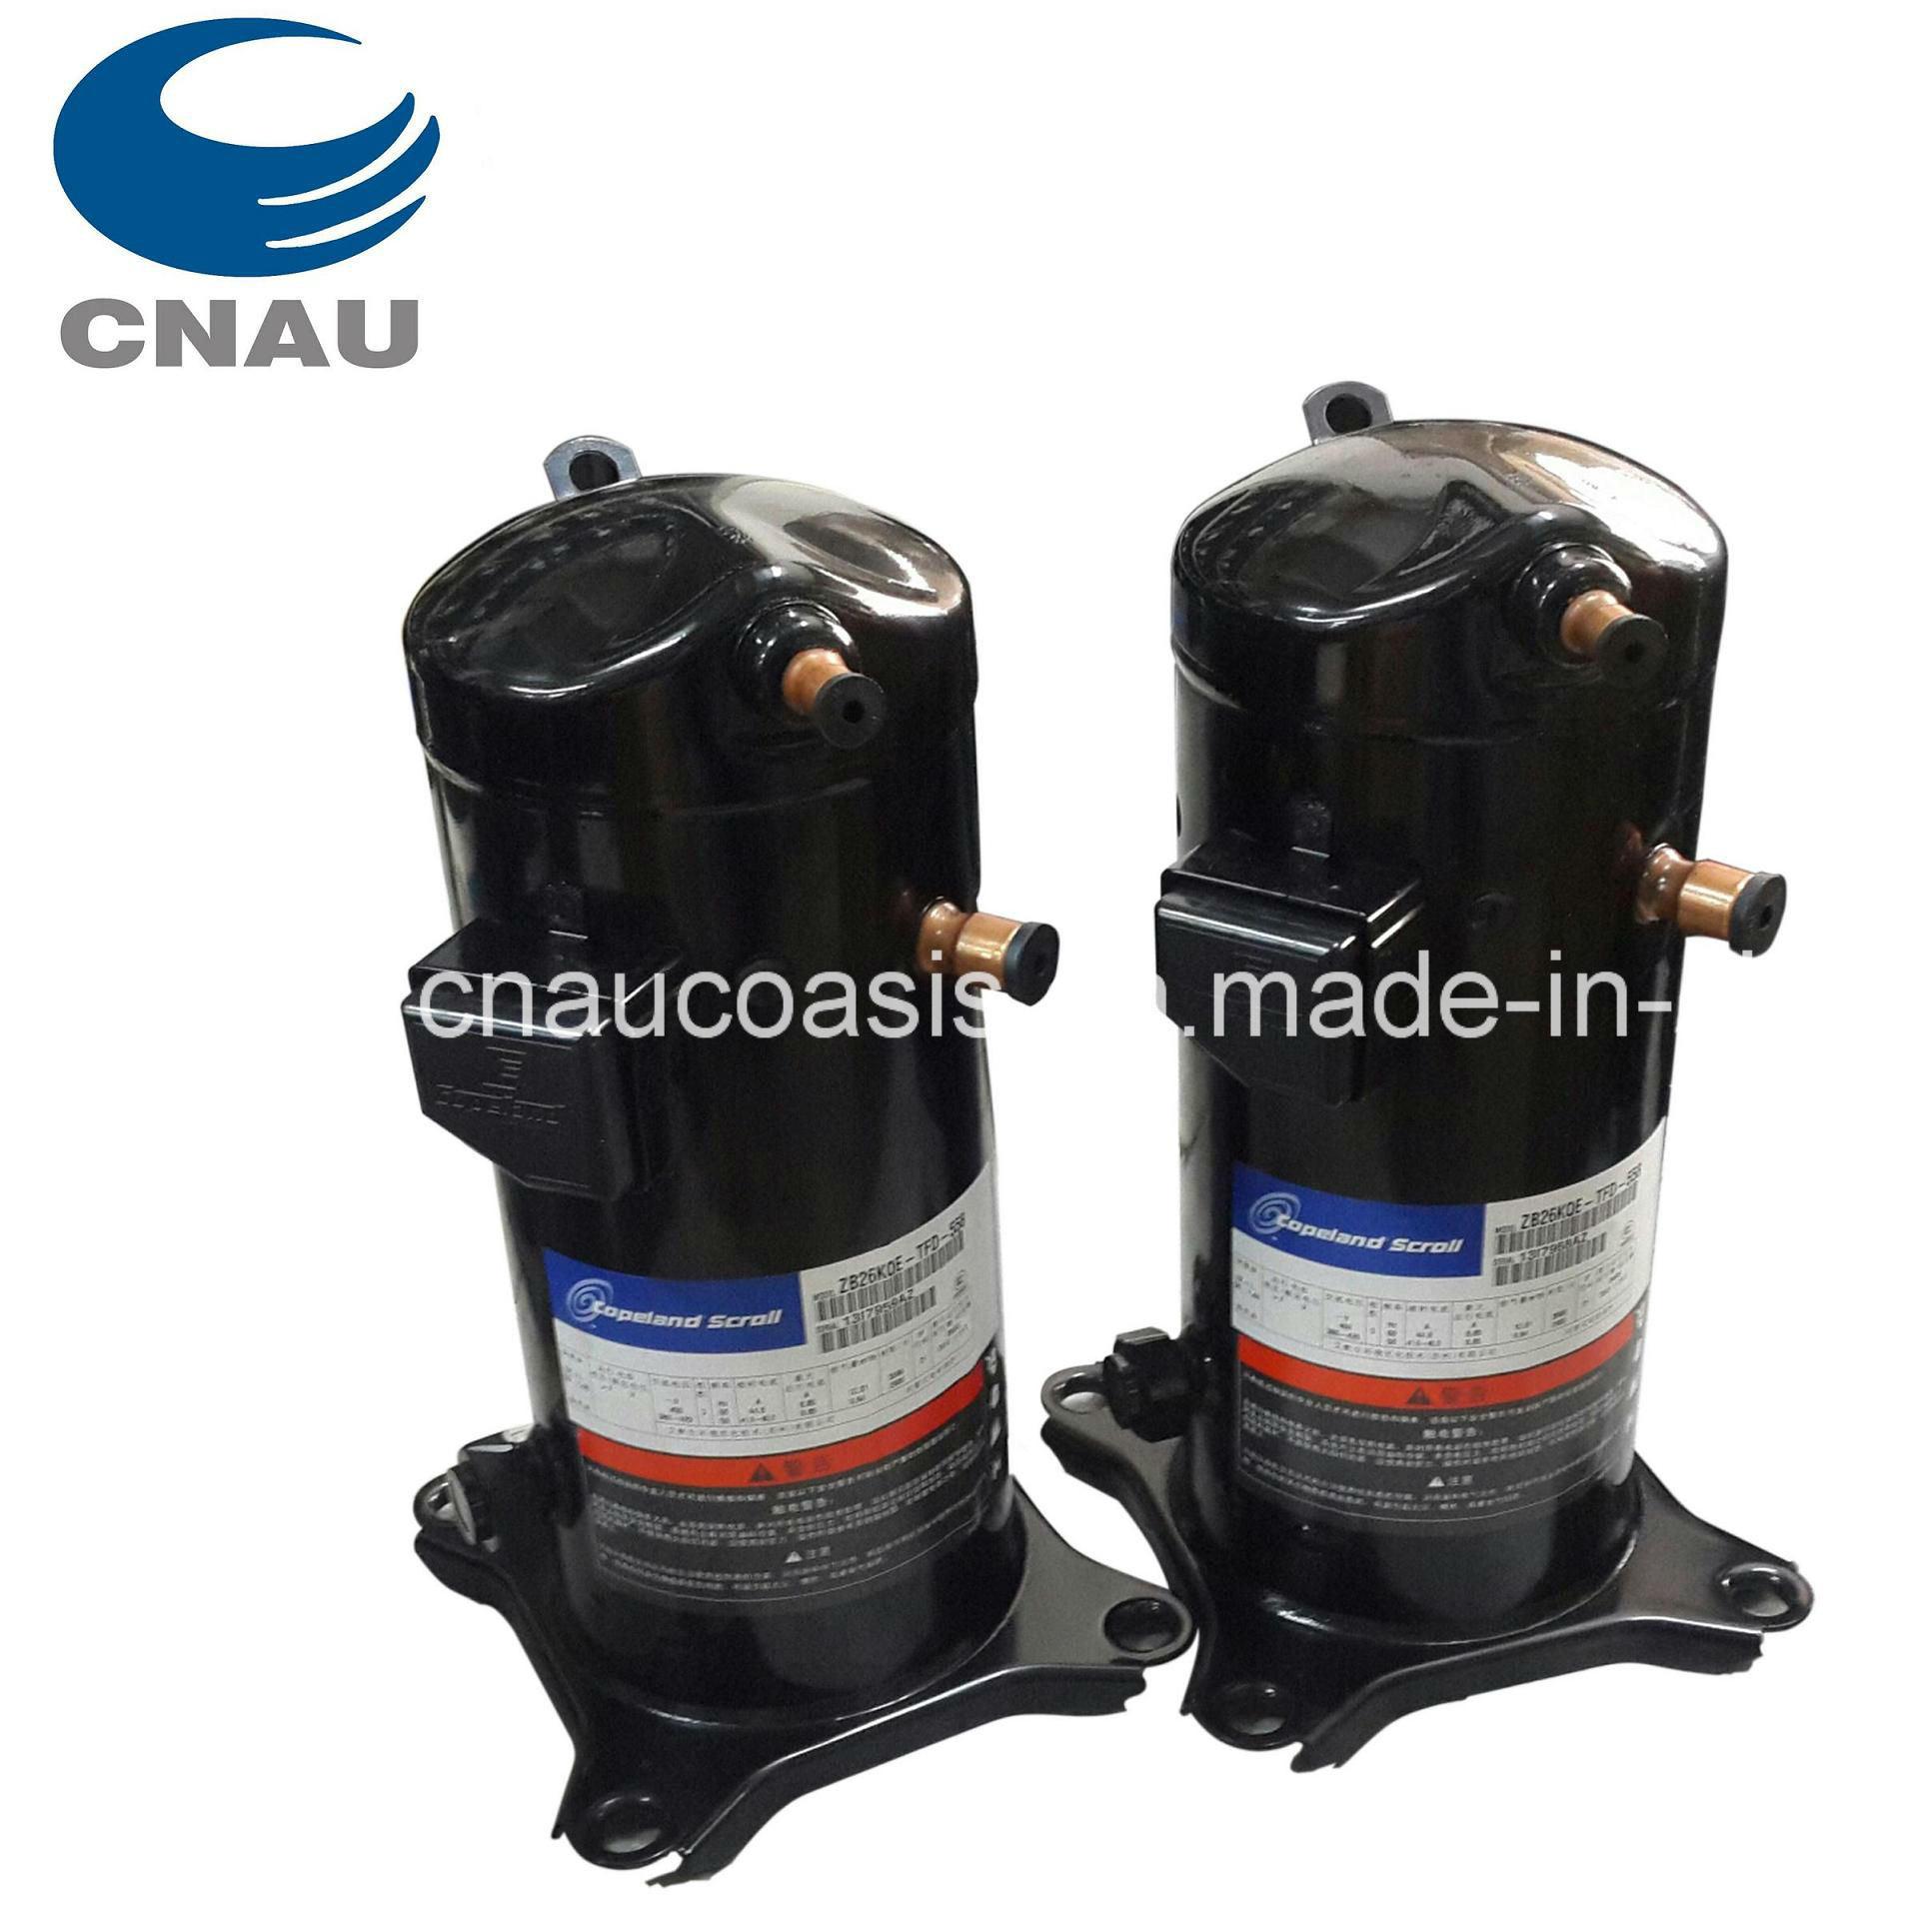 Zr/Zb Series Emerson Copeland Scroll Compressor for Air Conditioning / Refrigeration